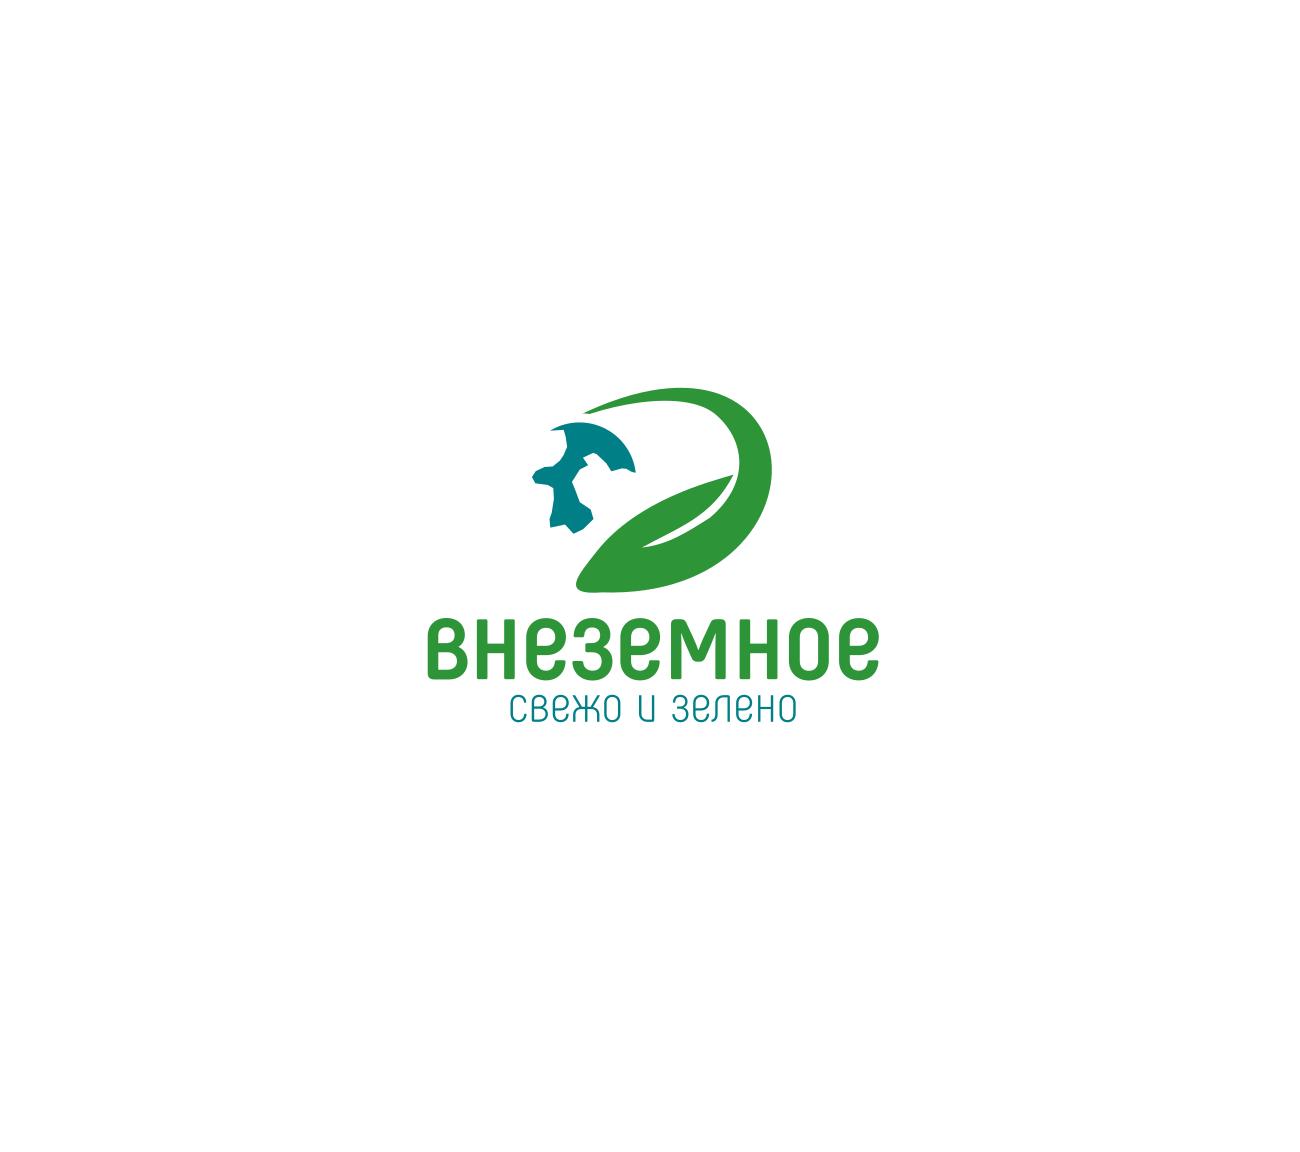 "Логотип и фирменный стиль ""Внеземное"" фото f_7335e768d85c05c8.png"